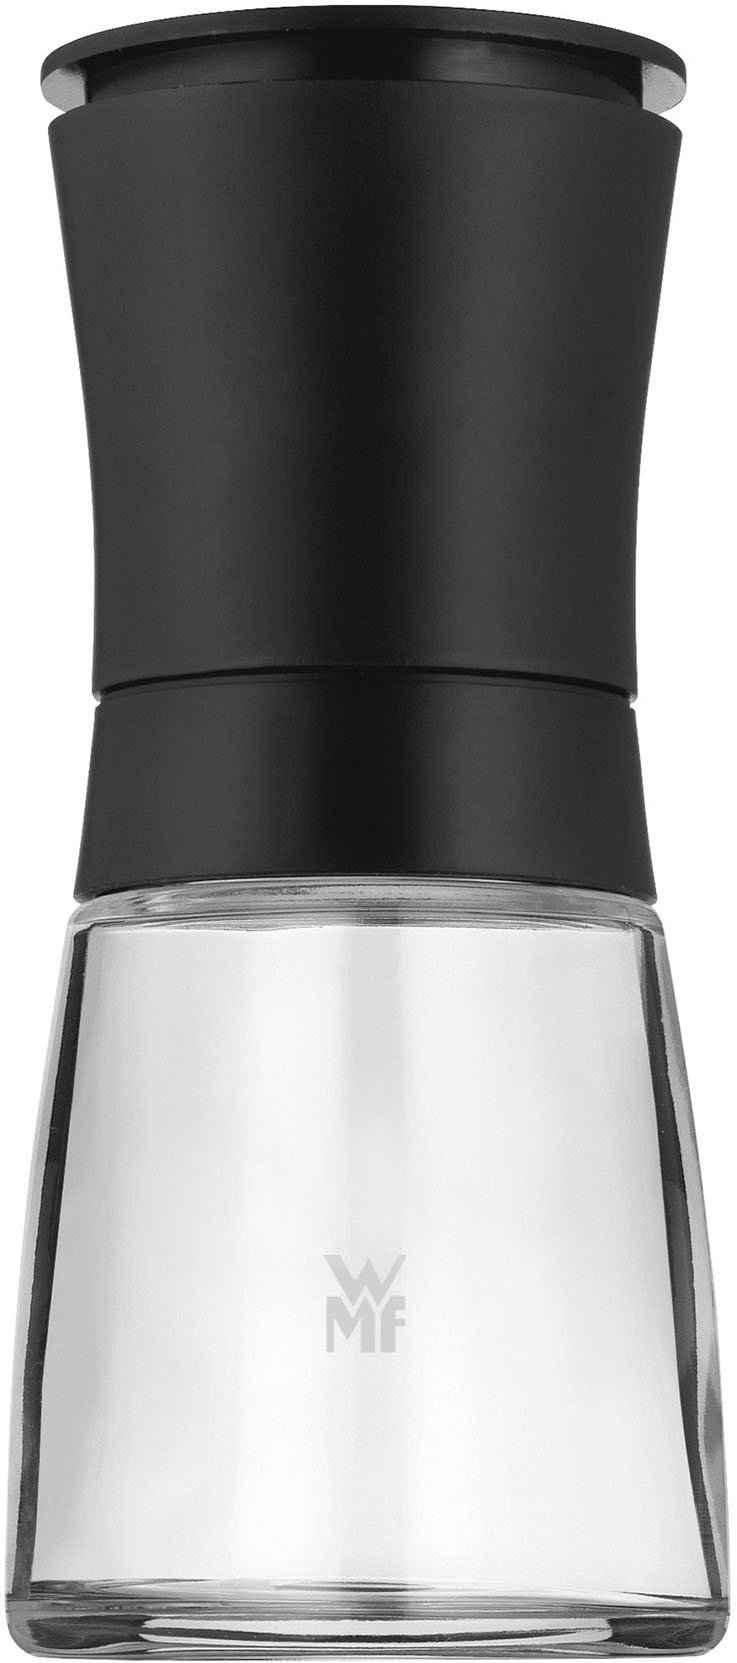 WMF Salz-/Pfeffermühle »Ceramill Trend« manuell, (1 Stück), unbefüllt